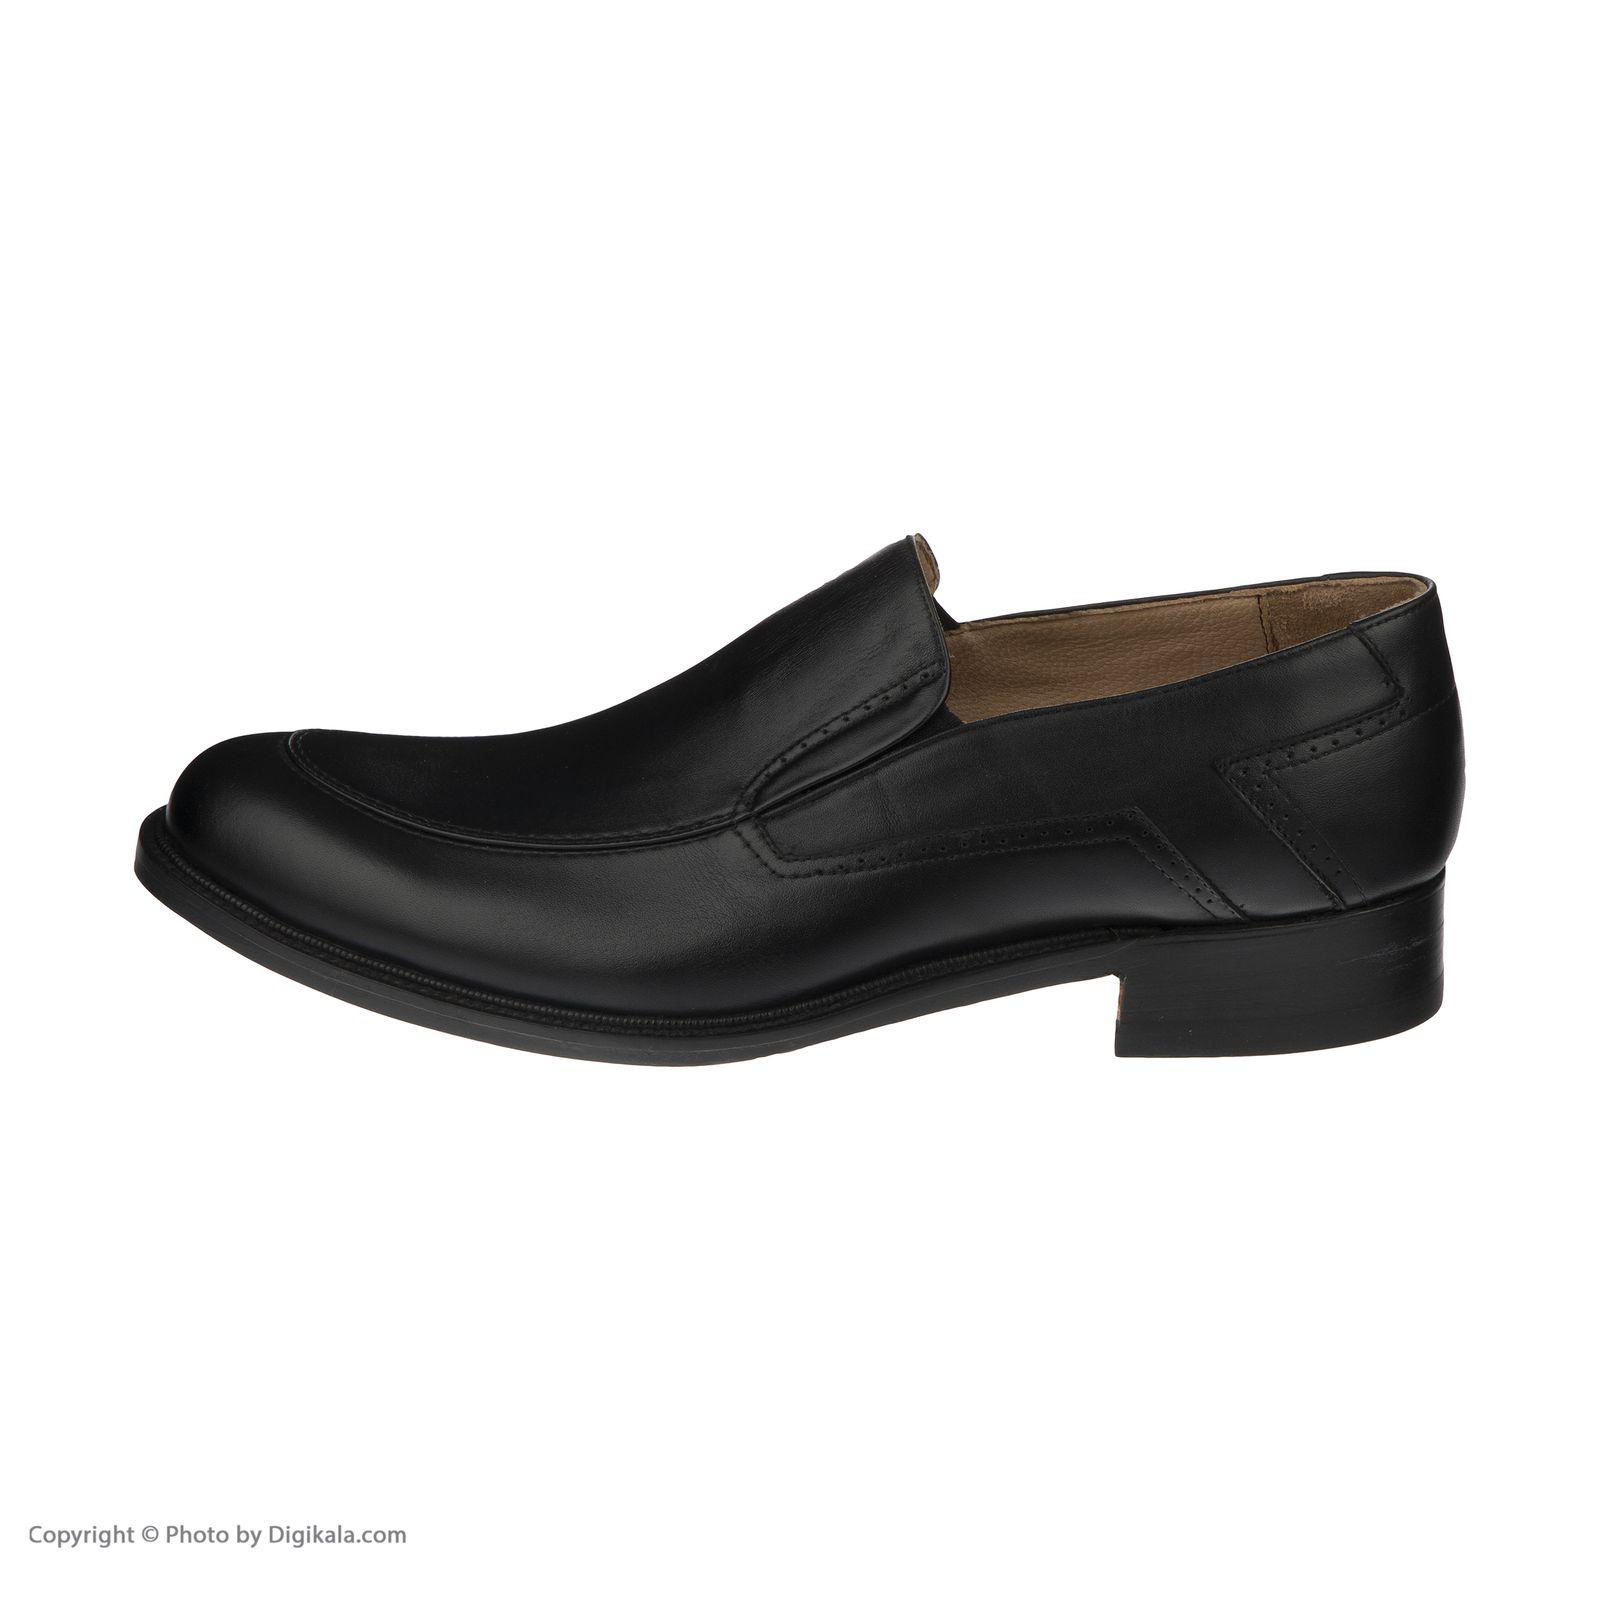 کفش مردانه نظری کد 426 -  - 1